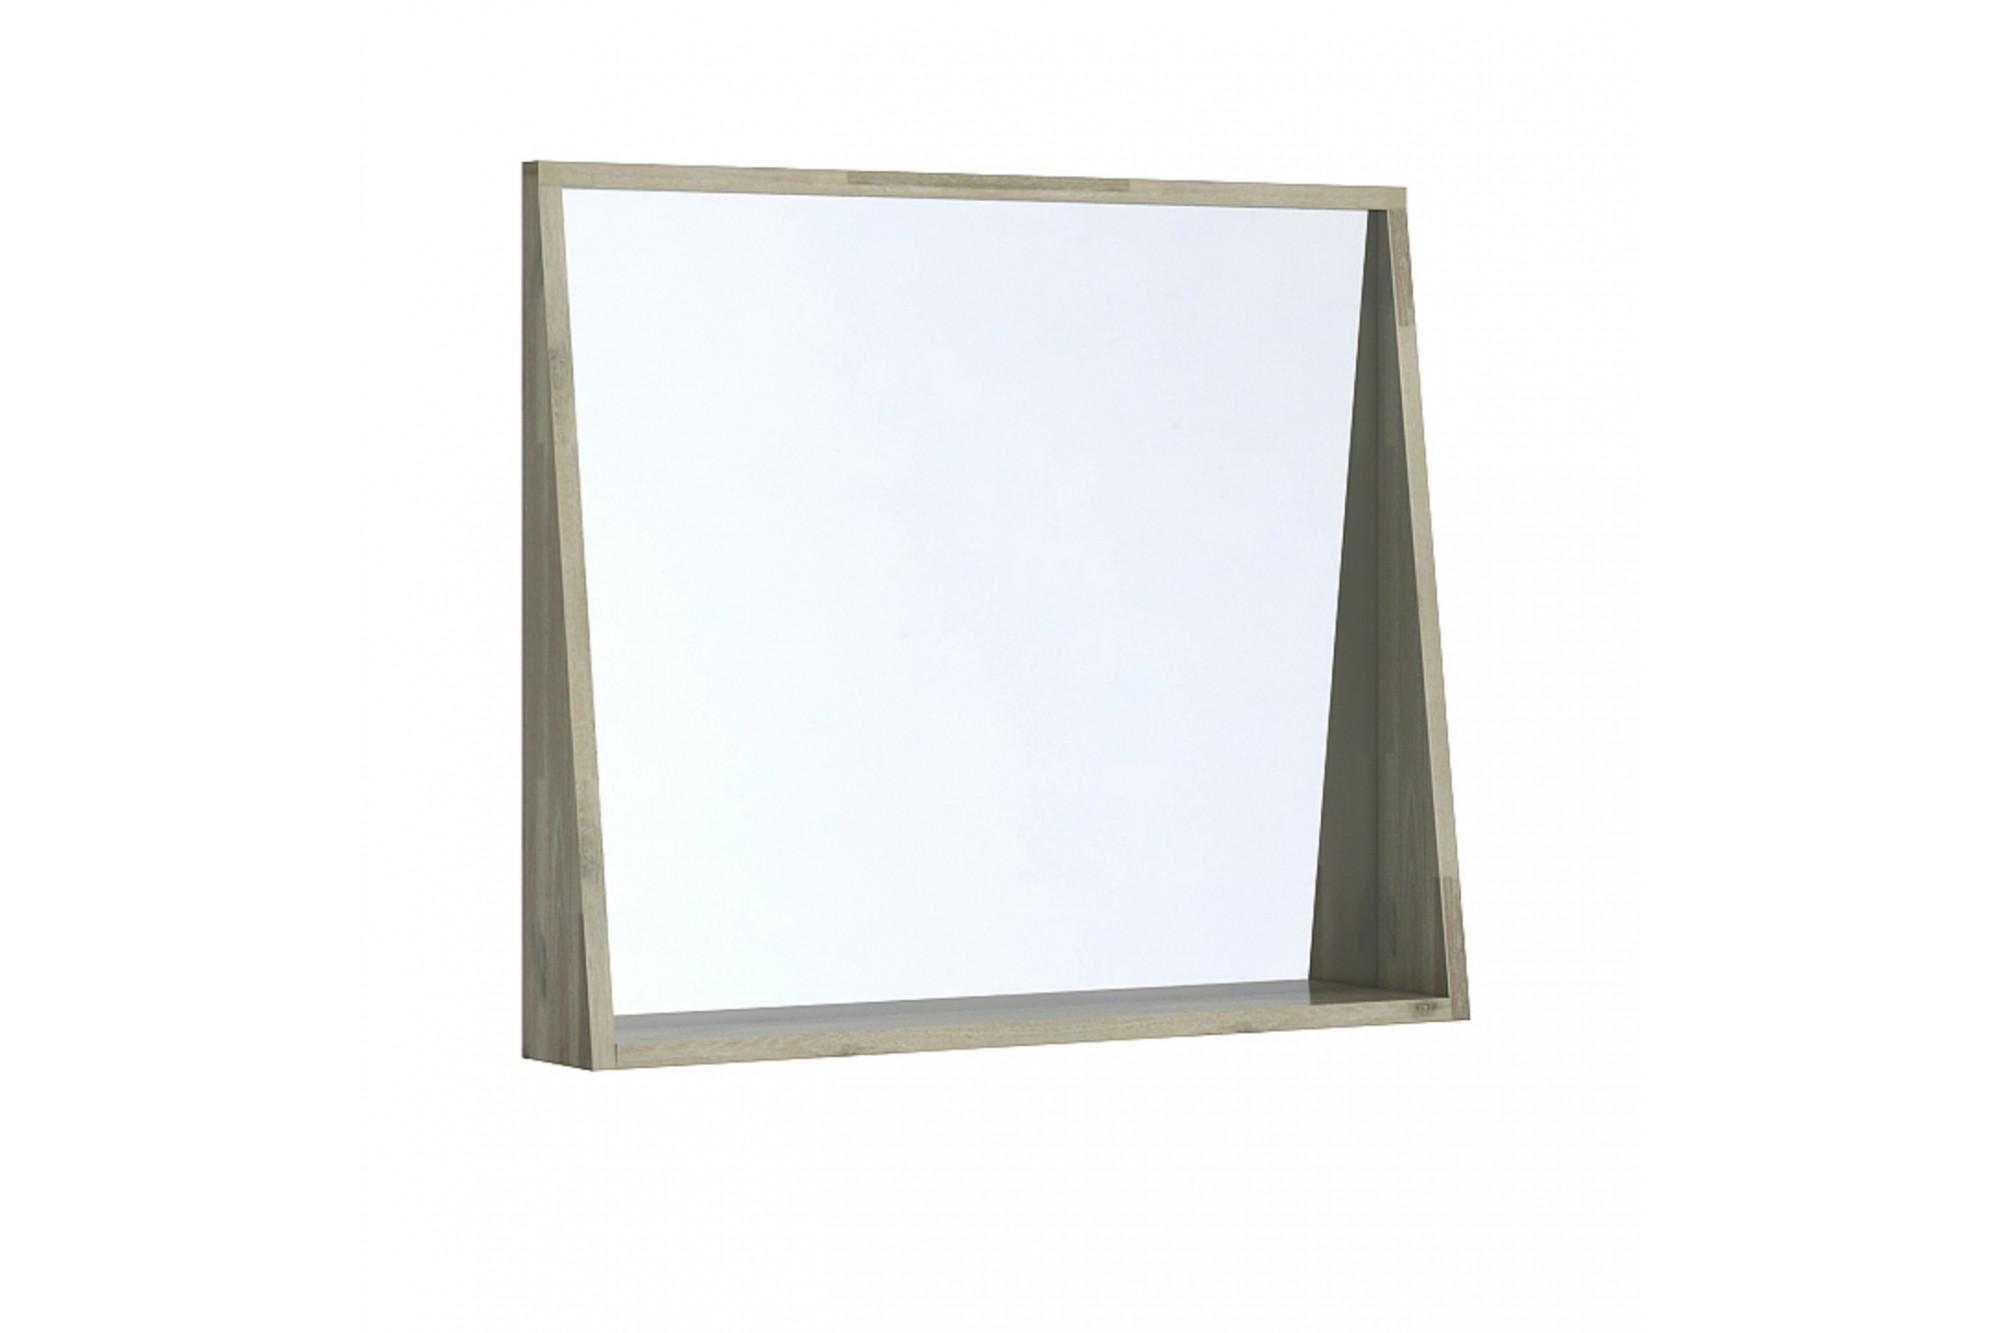 Miroir Salle De Bain 120 Cm miroir de salle de bain en bois massif de 80 cm - hellin